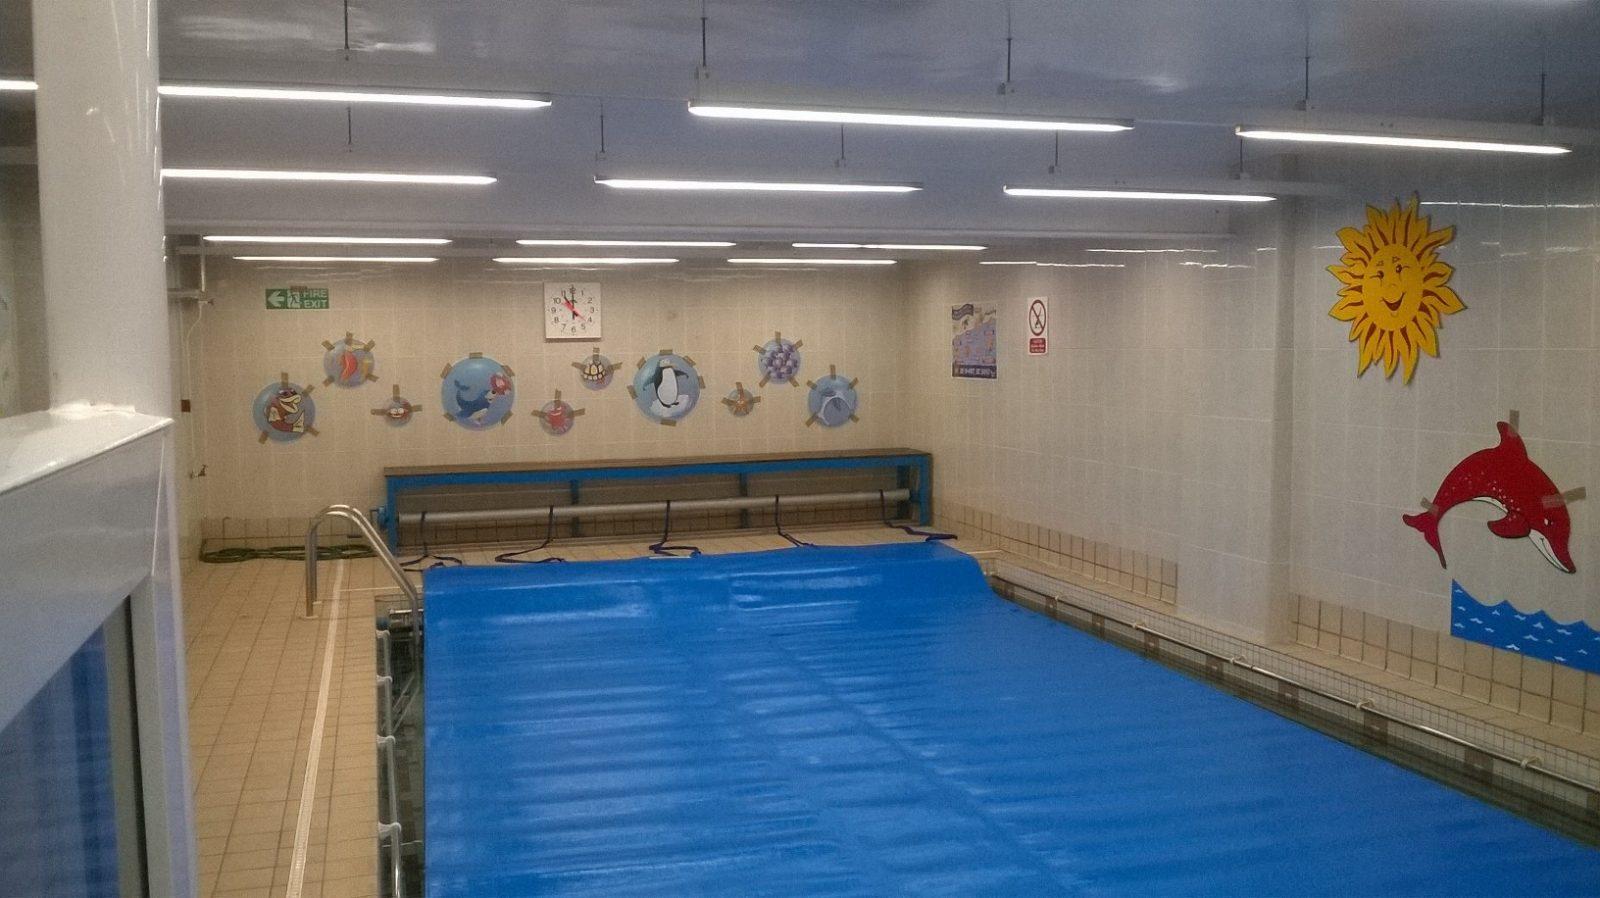 Linear LED Internal Lighting For Swimming Pools